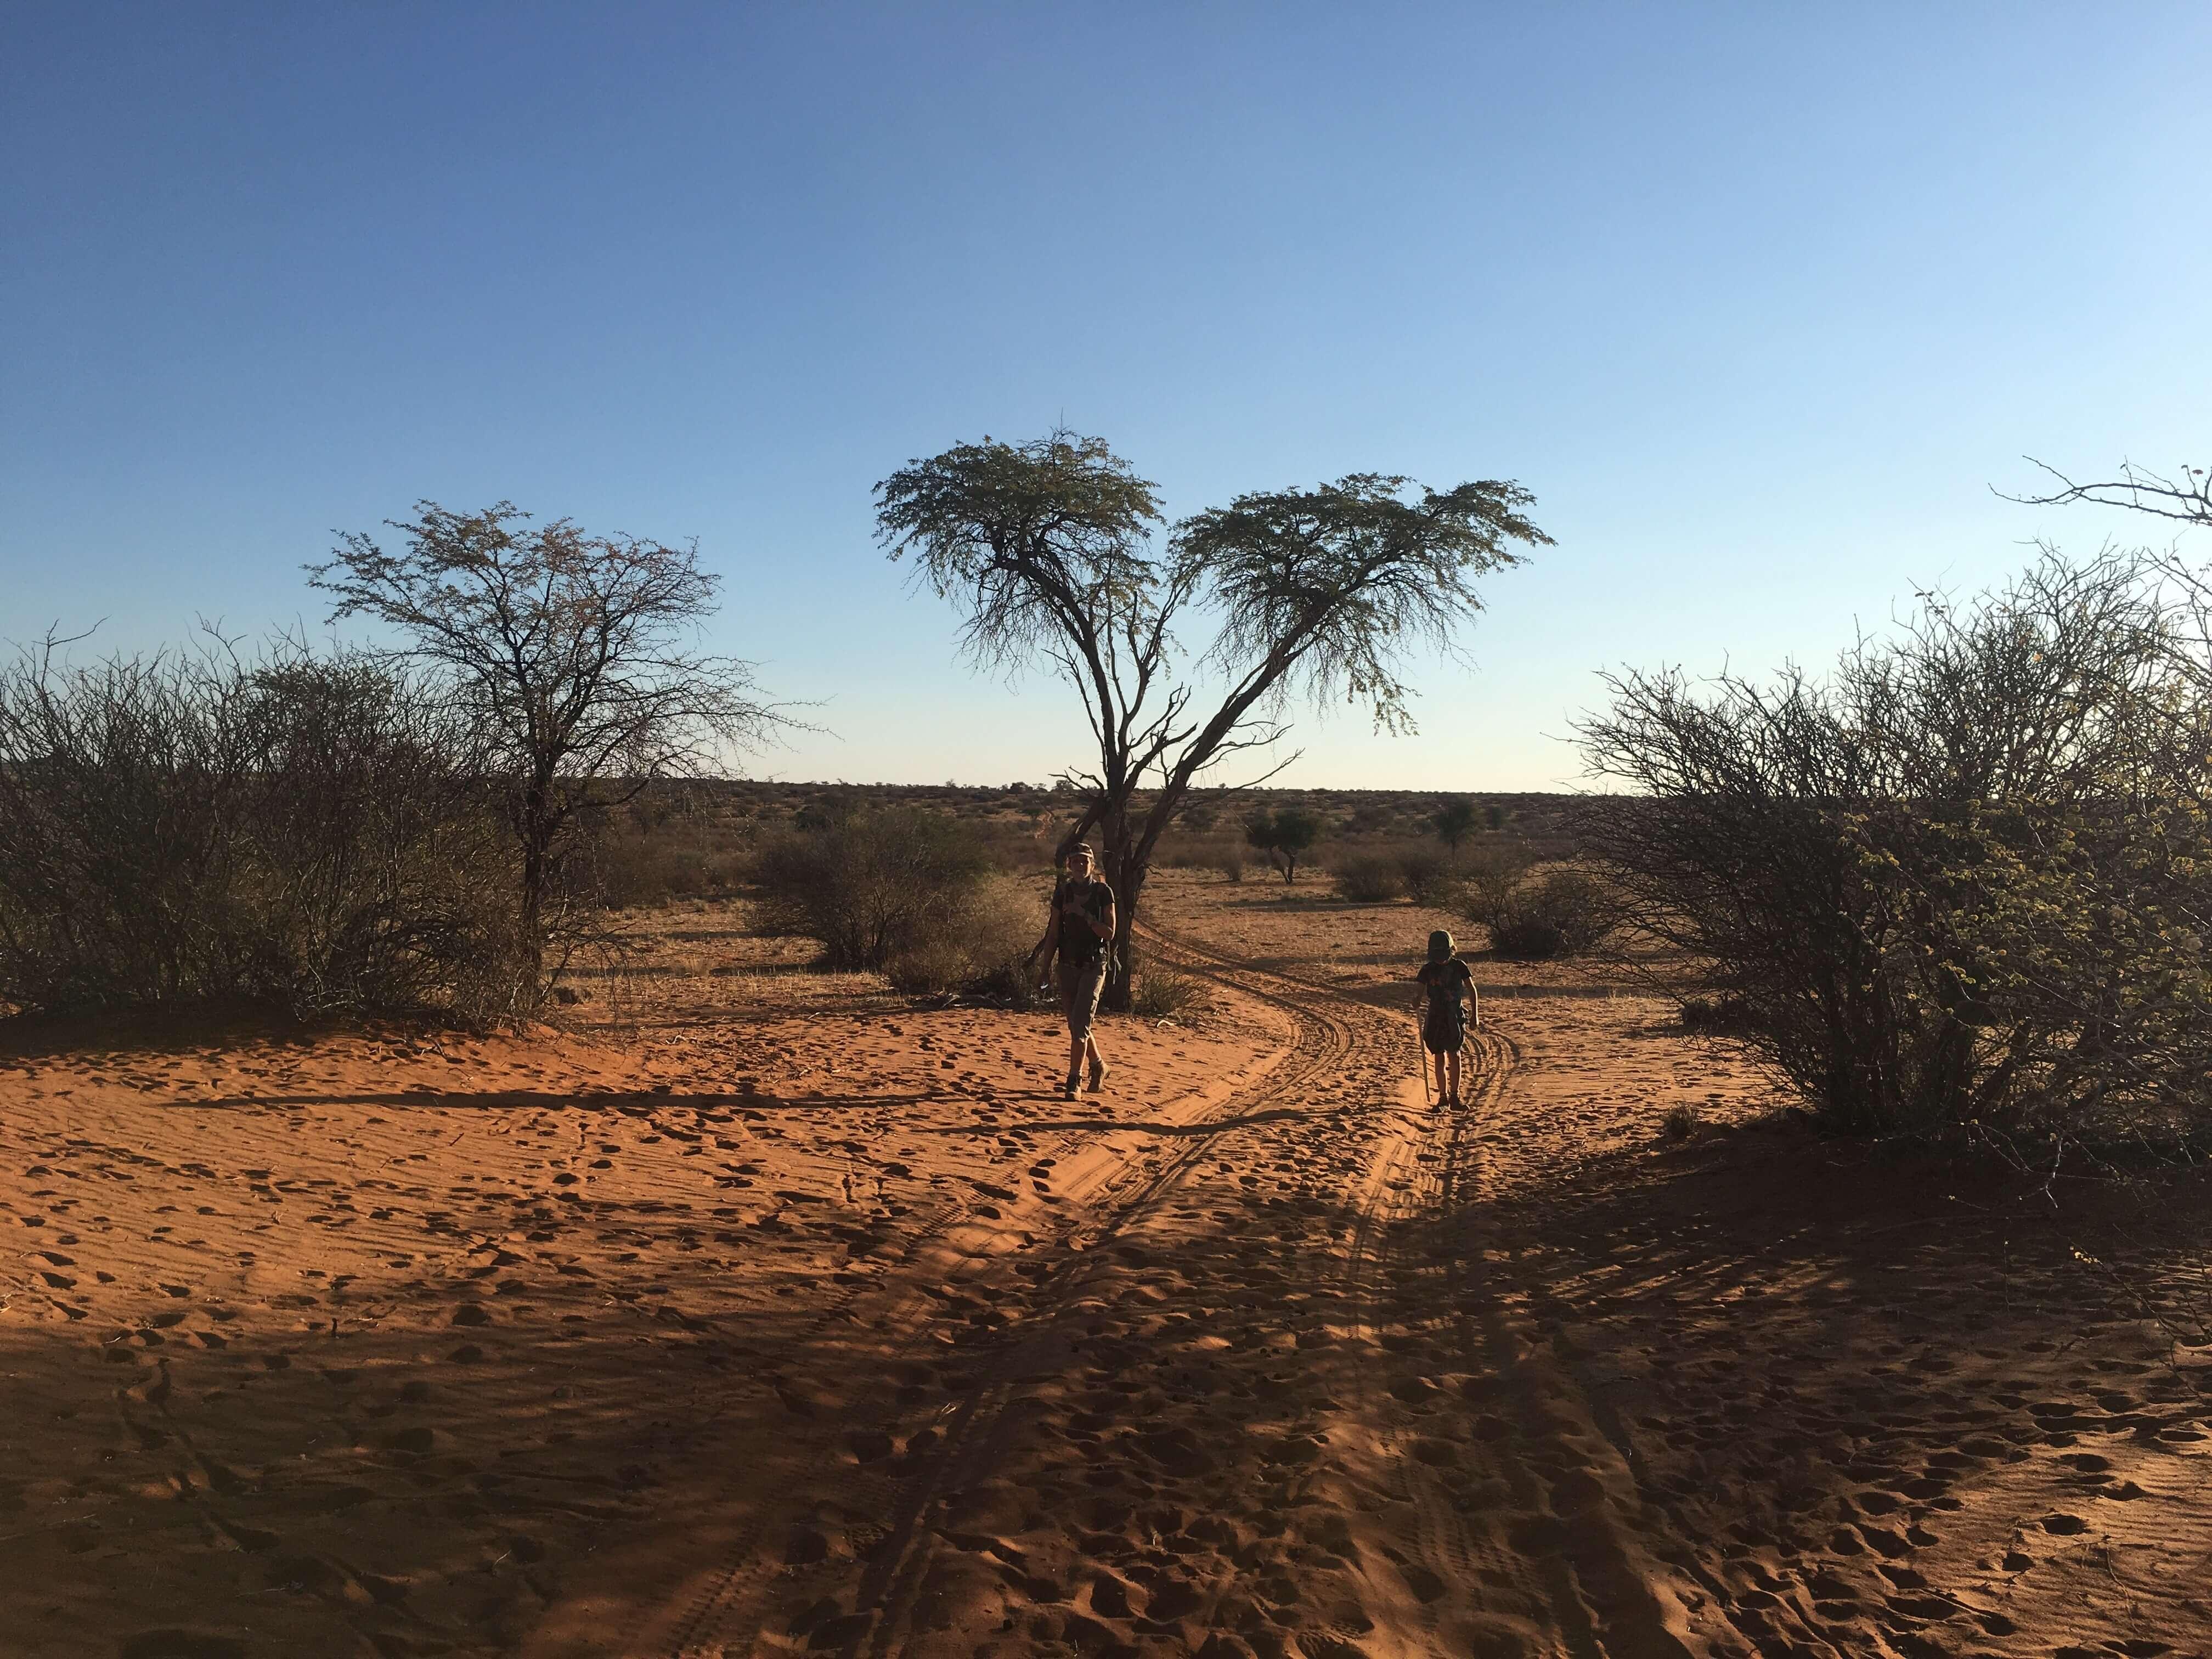 Familie van der Kolk op wandel safari in Namibië